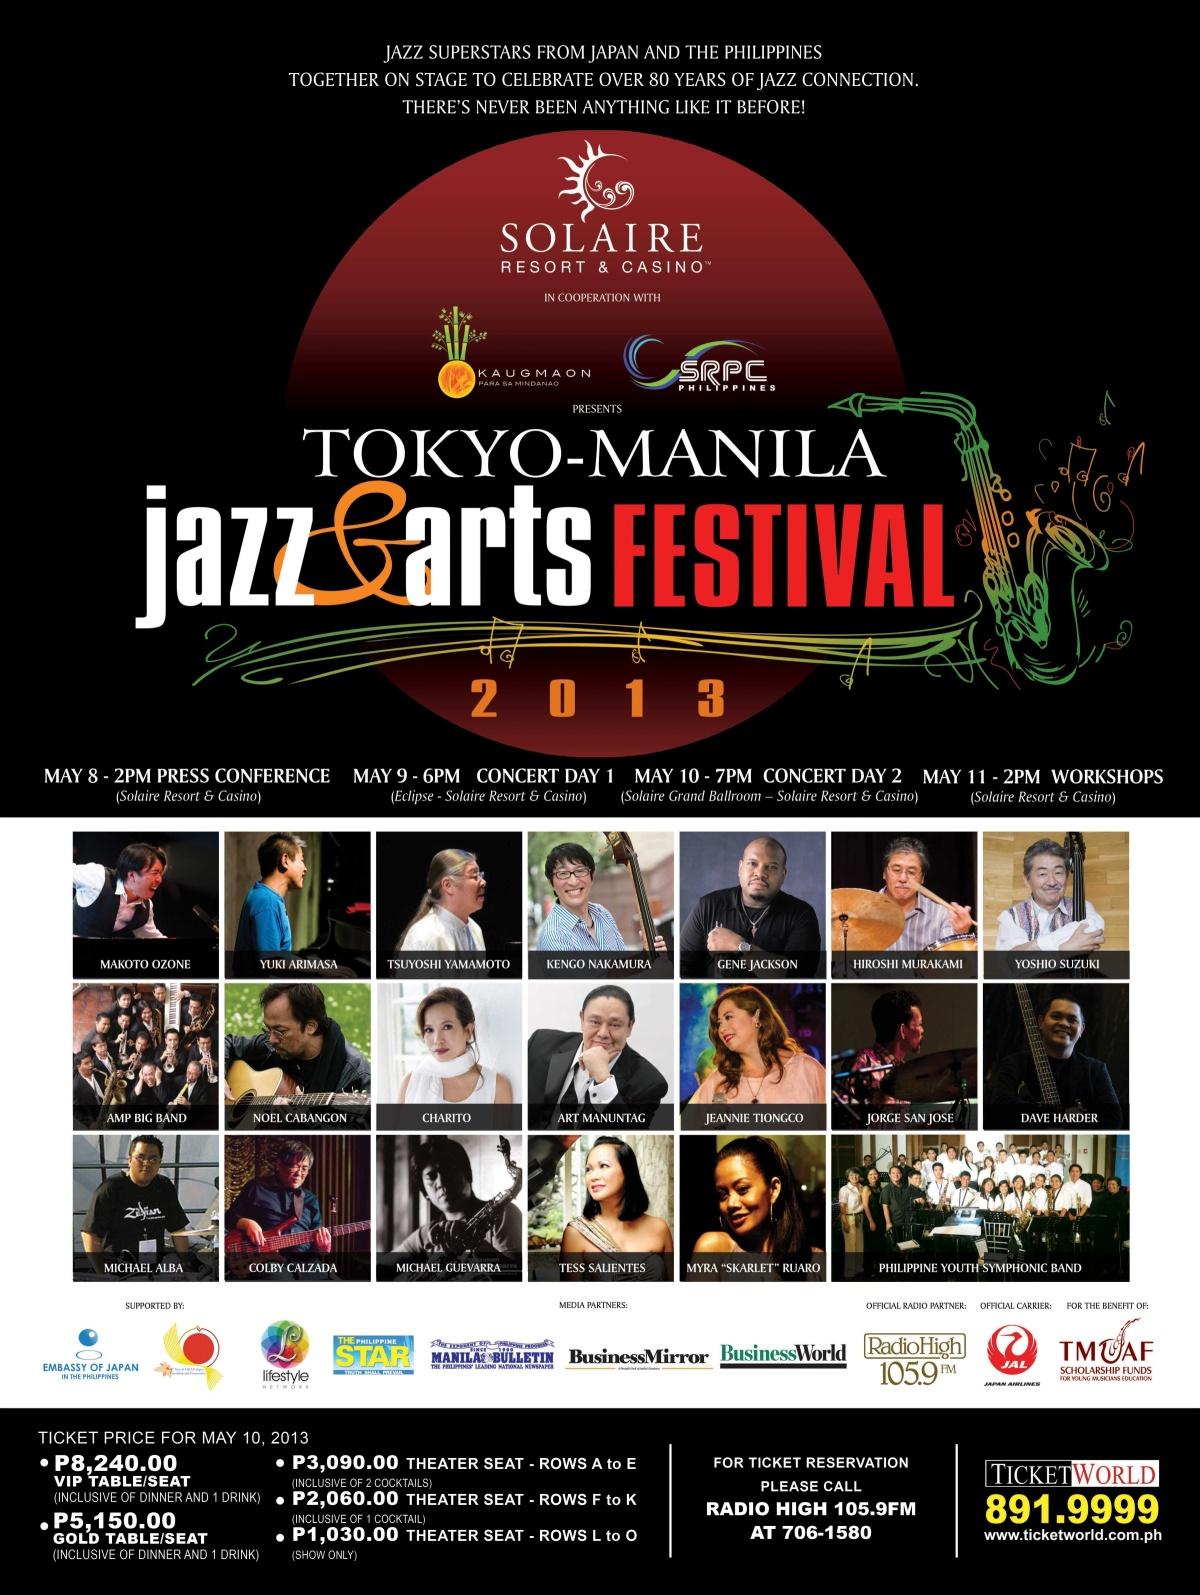 Tokyo-Manila Jazz & Arts Festival 2013